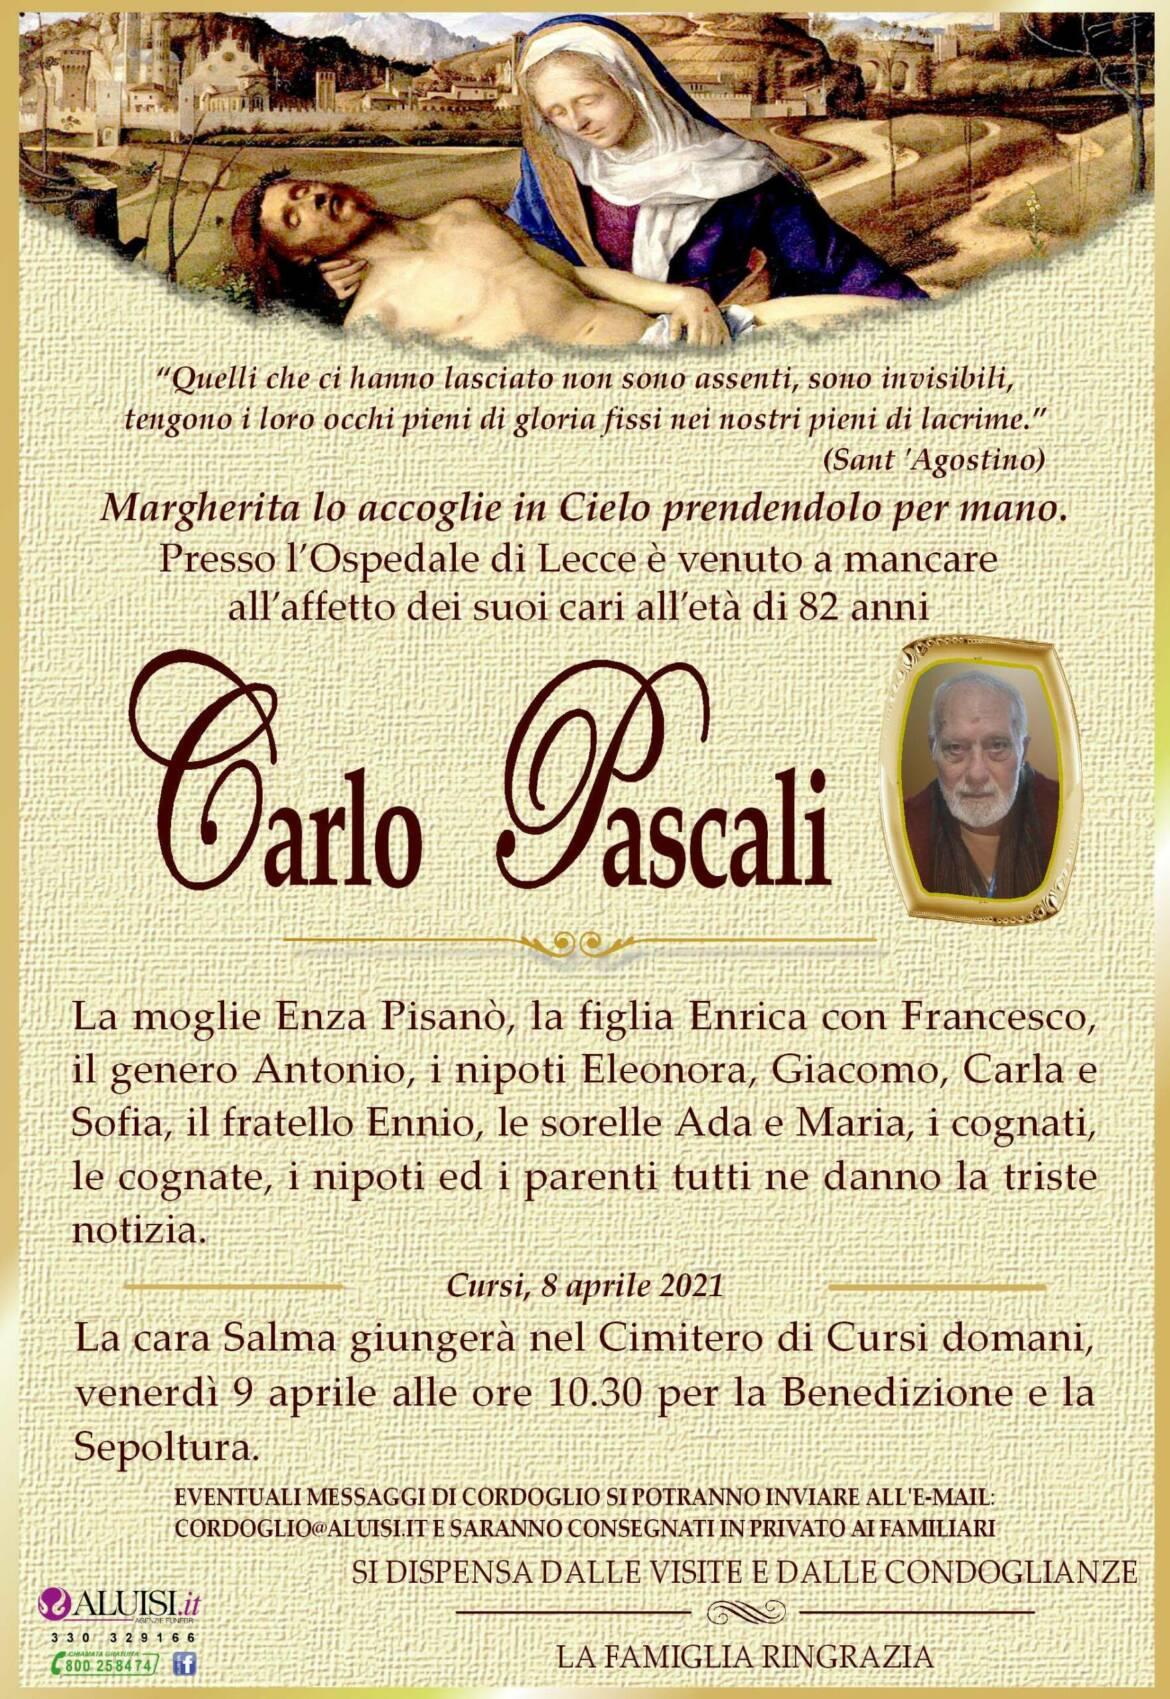 Annuncio-carlo-pascali-cursi-scaled.jpg